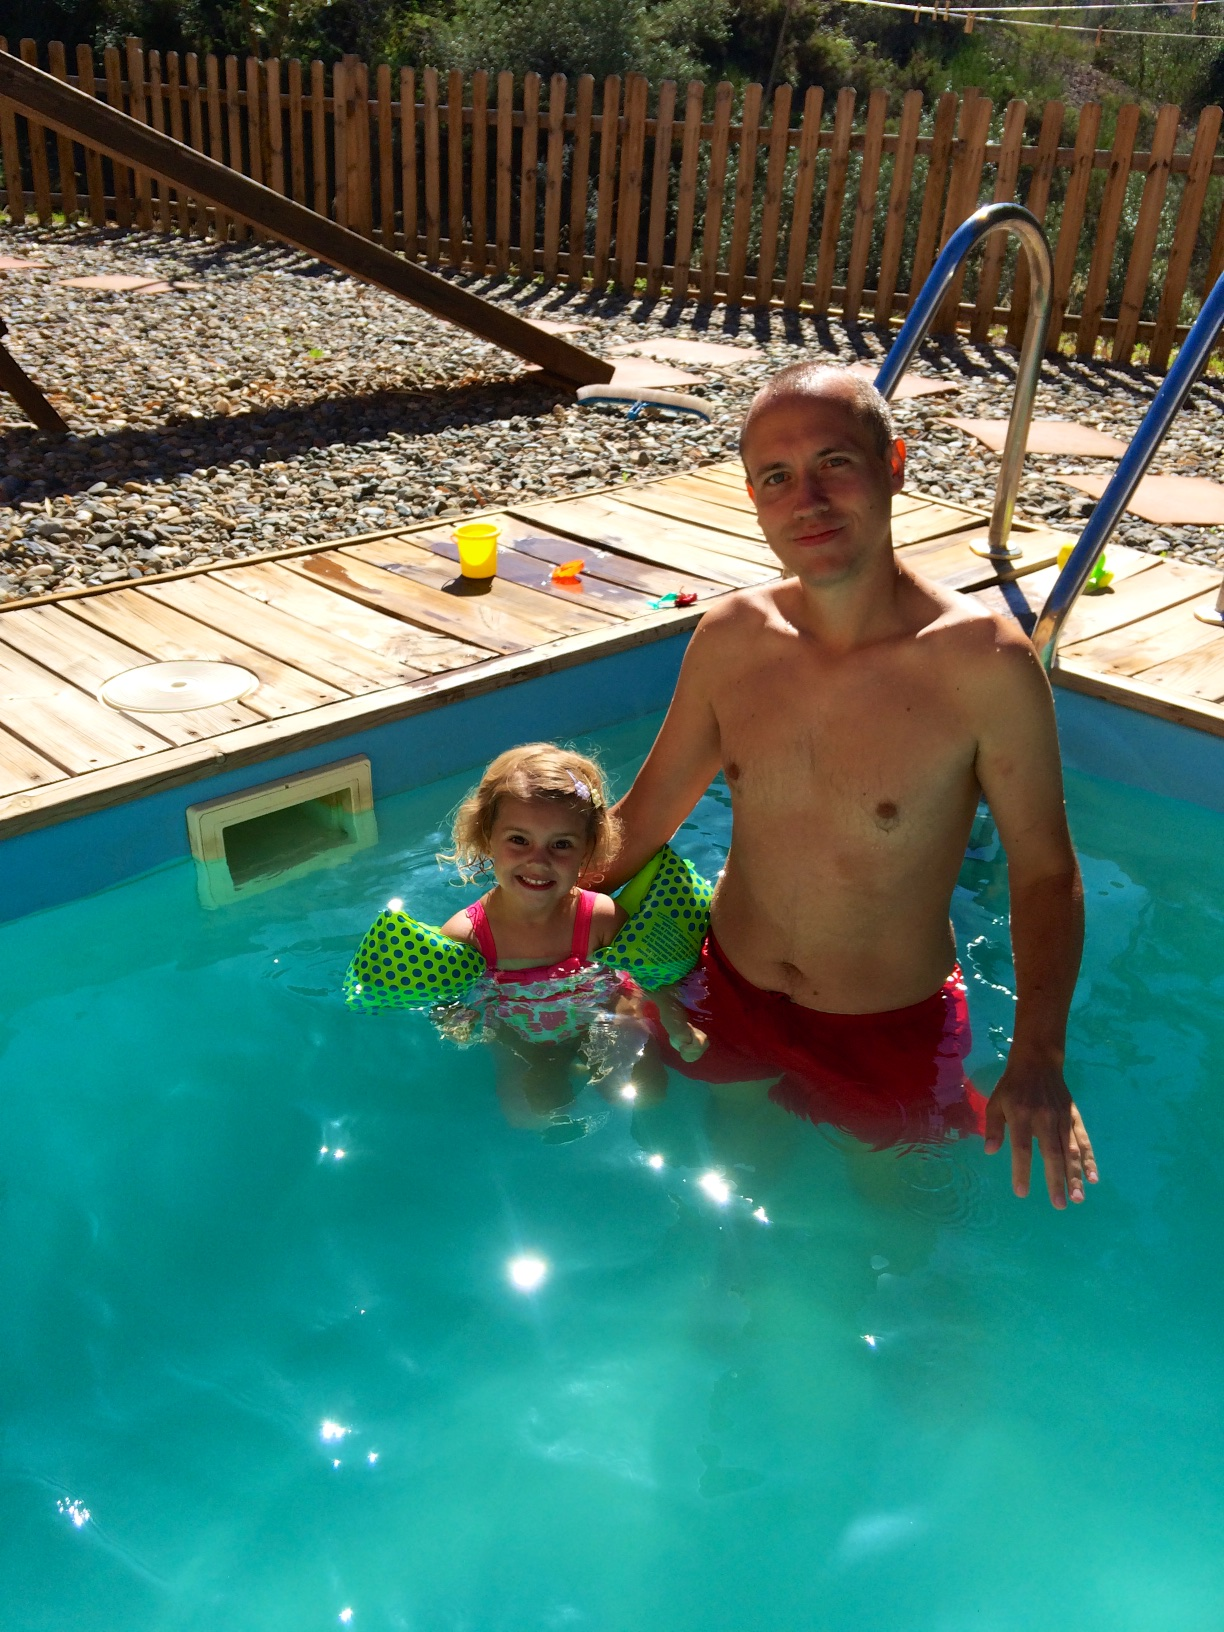 Swimming in October